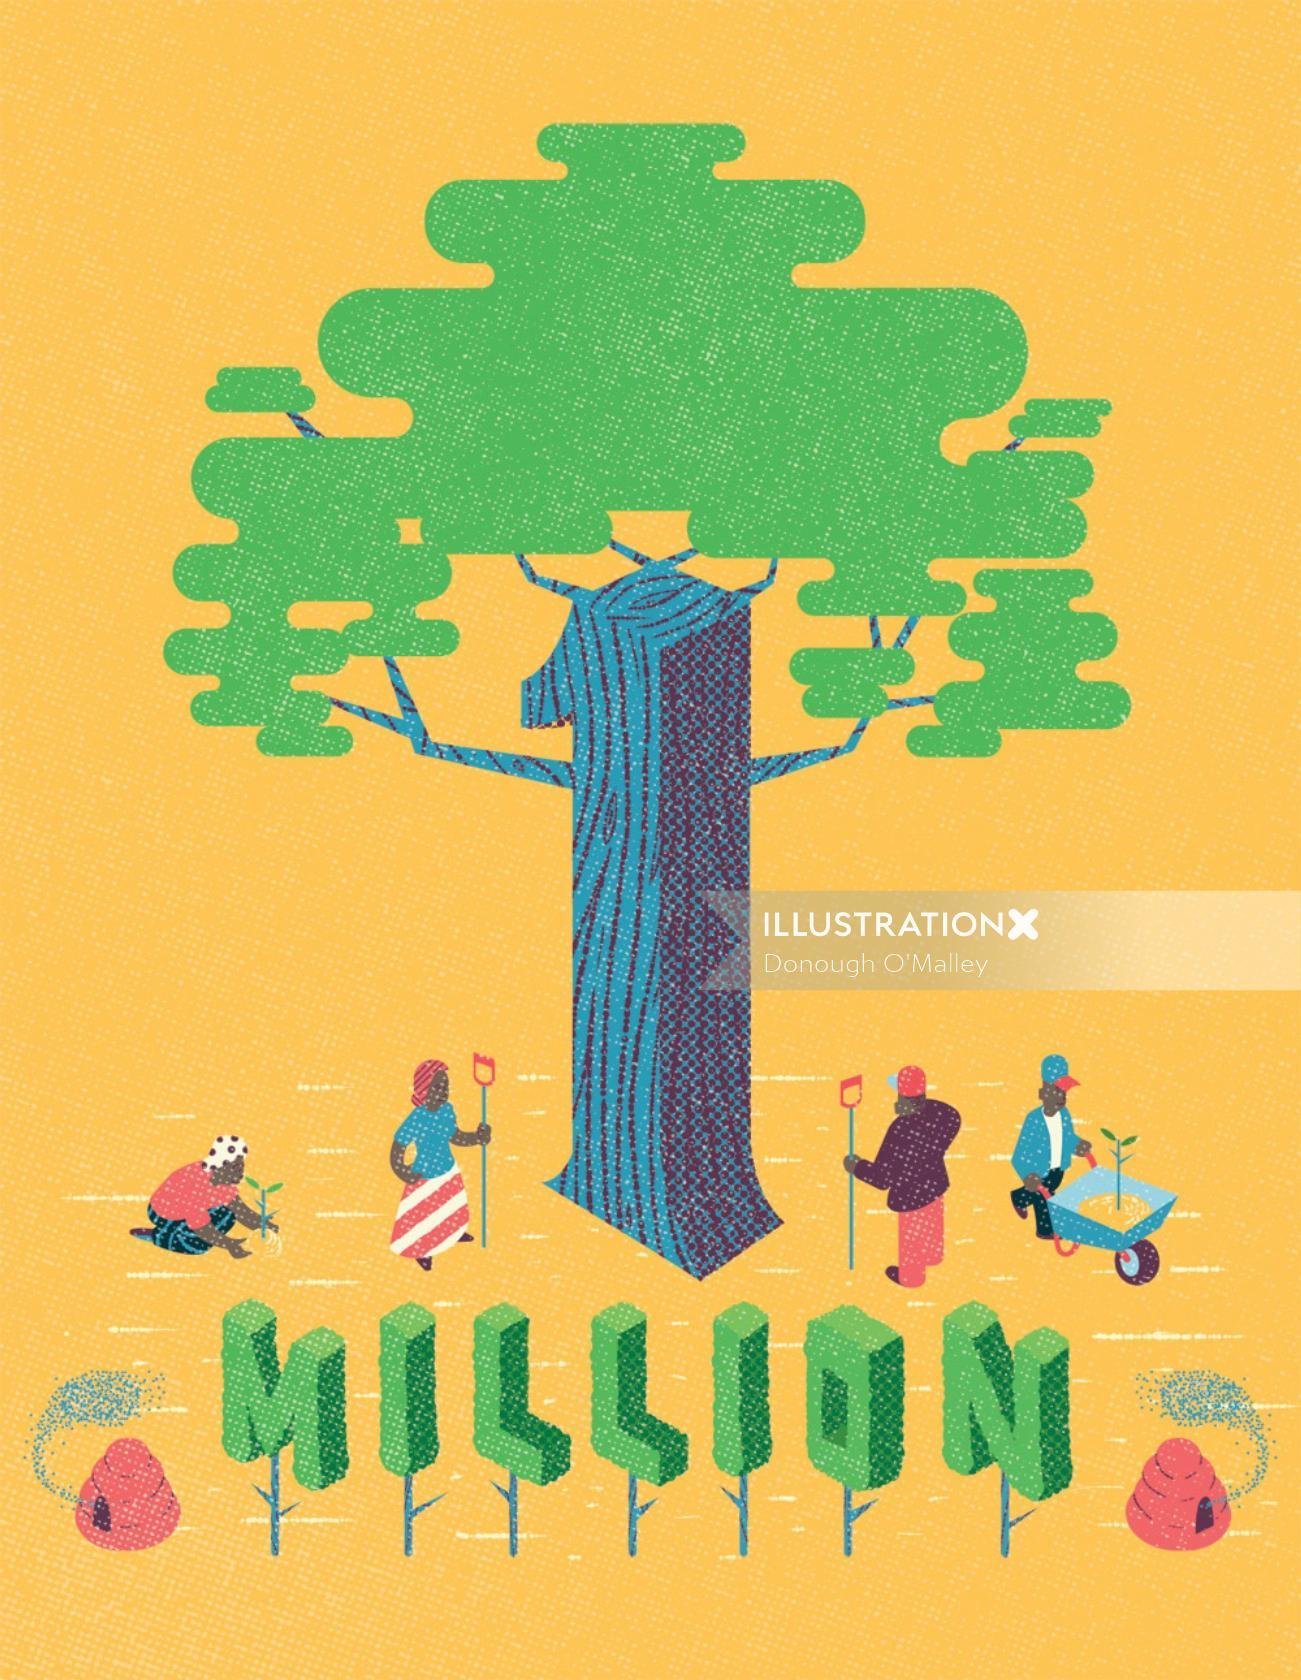 Congratulations Illustration for llustrationltd on planting over 1 million trees